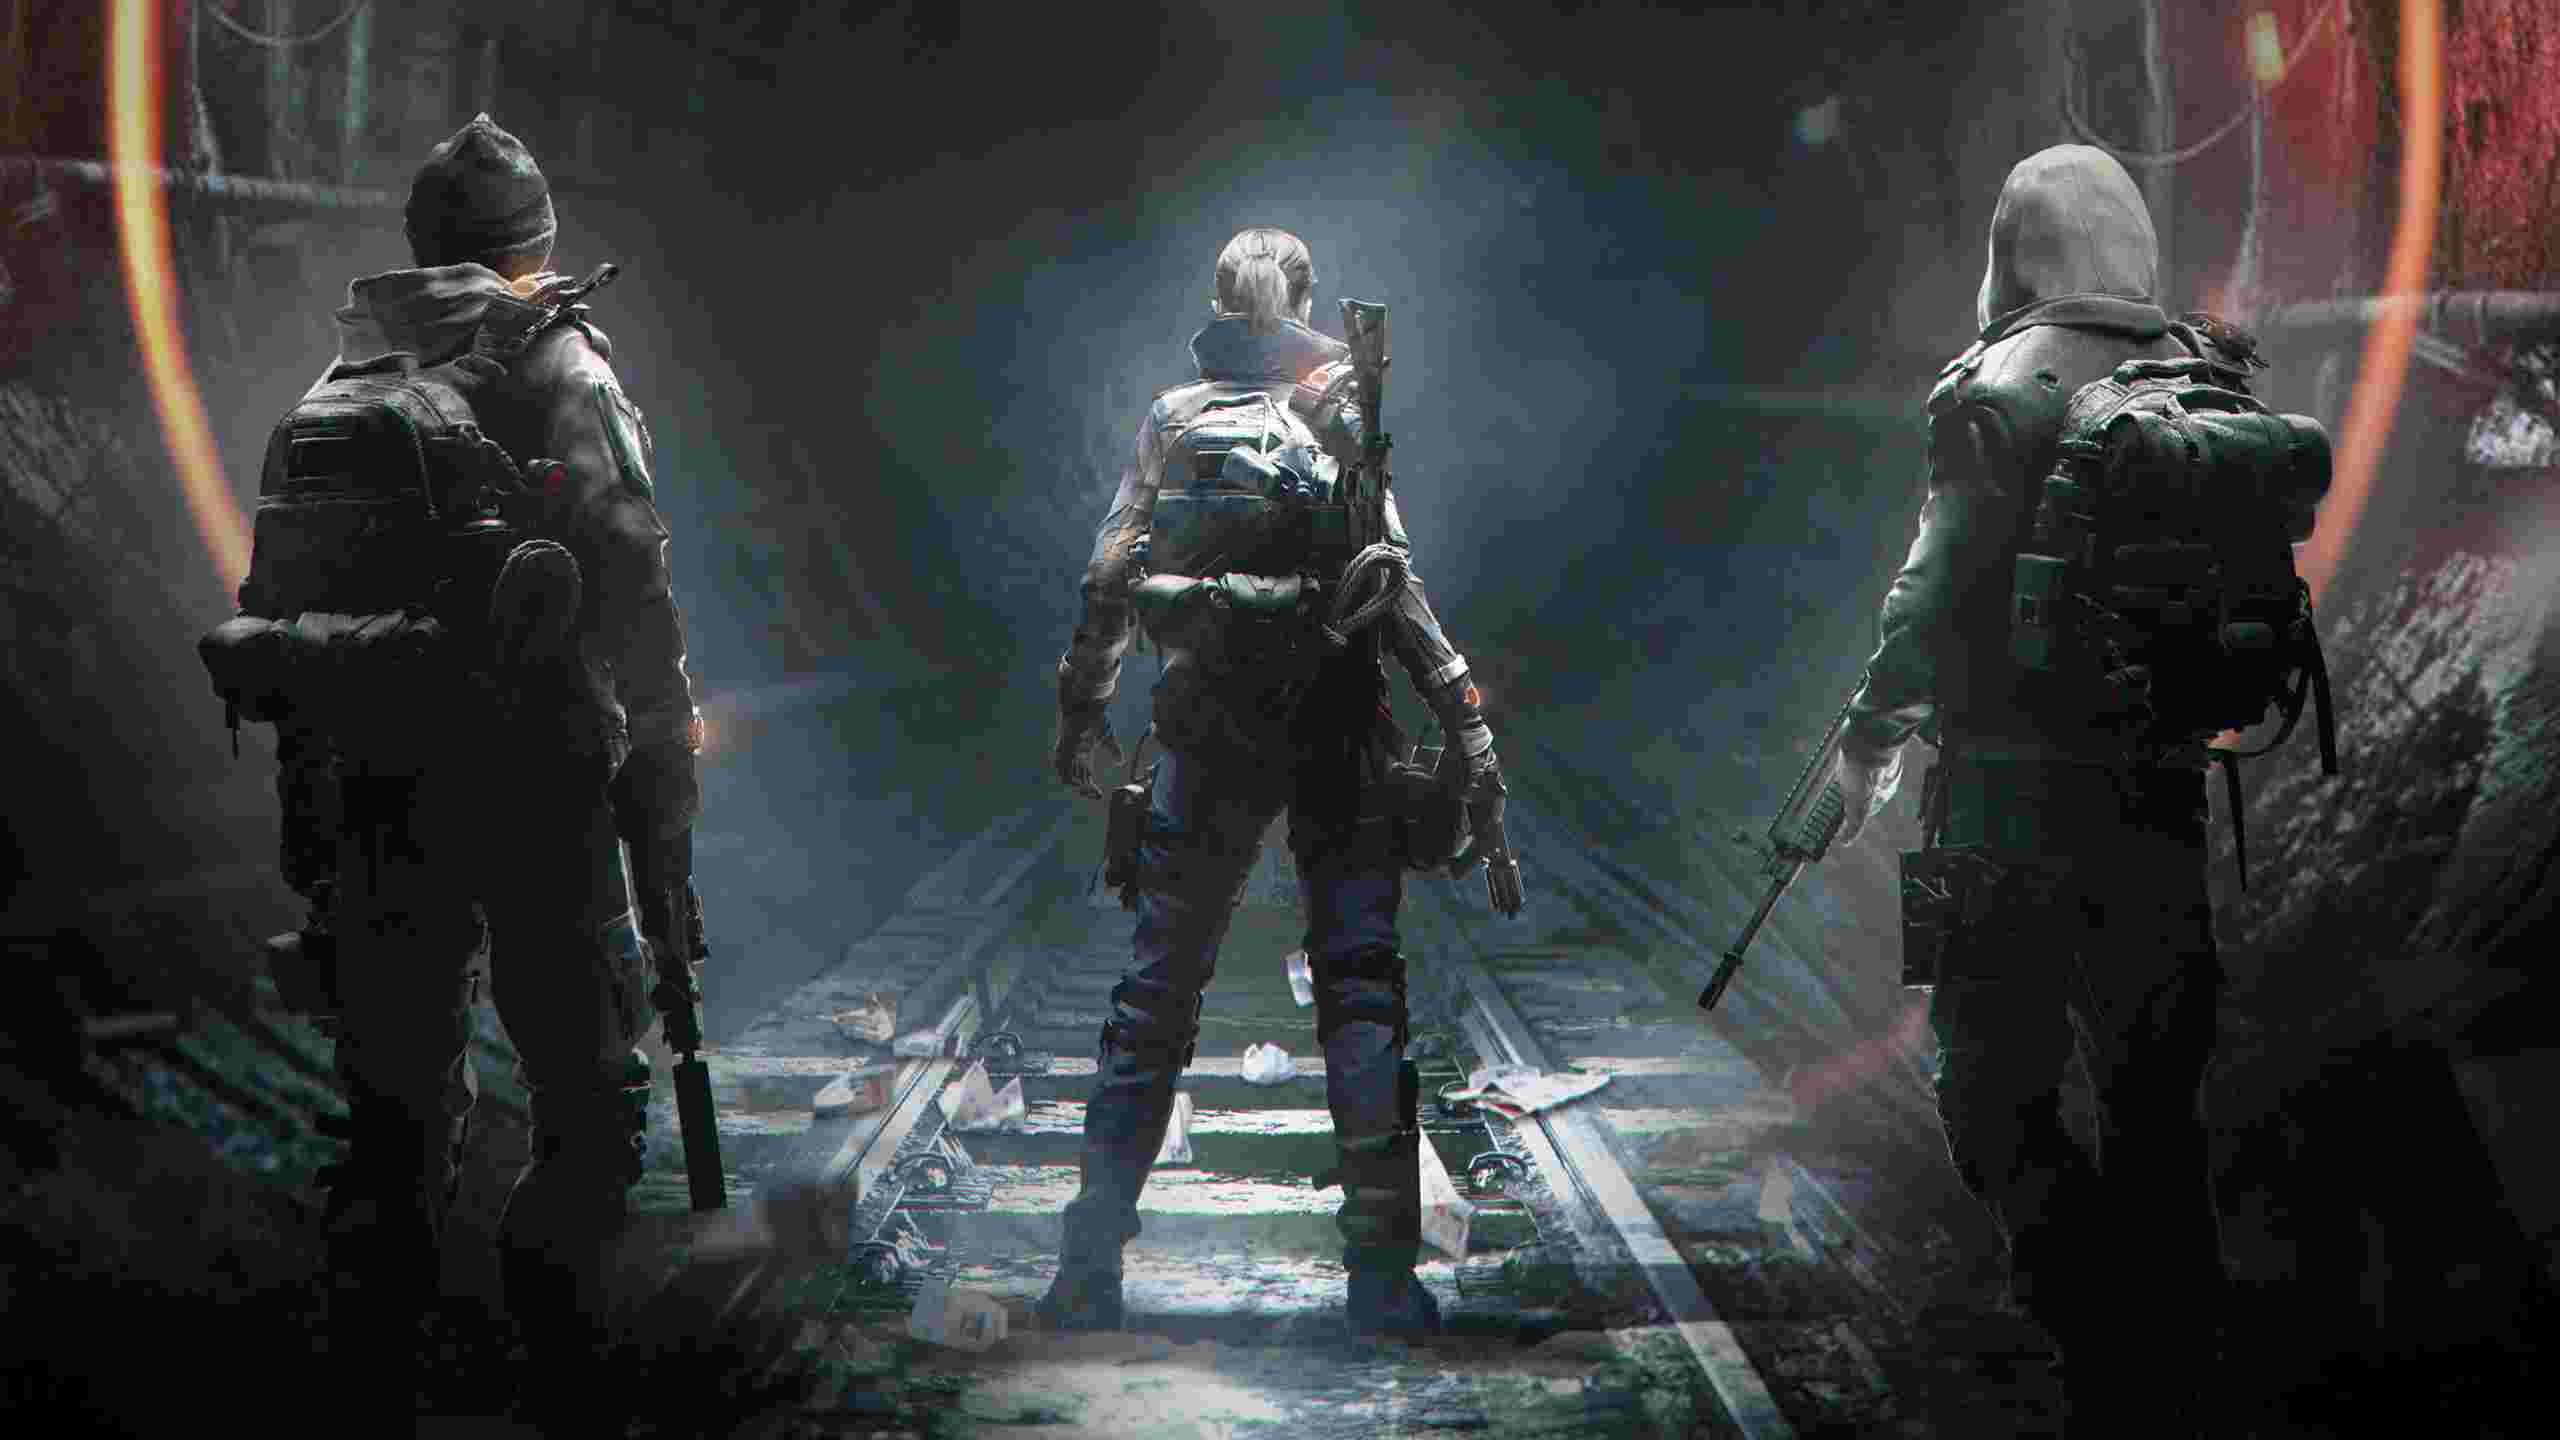 tc-the-divison-underground-wallpaper-agents-tunnel